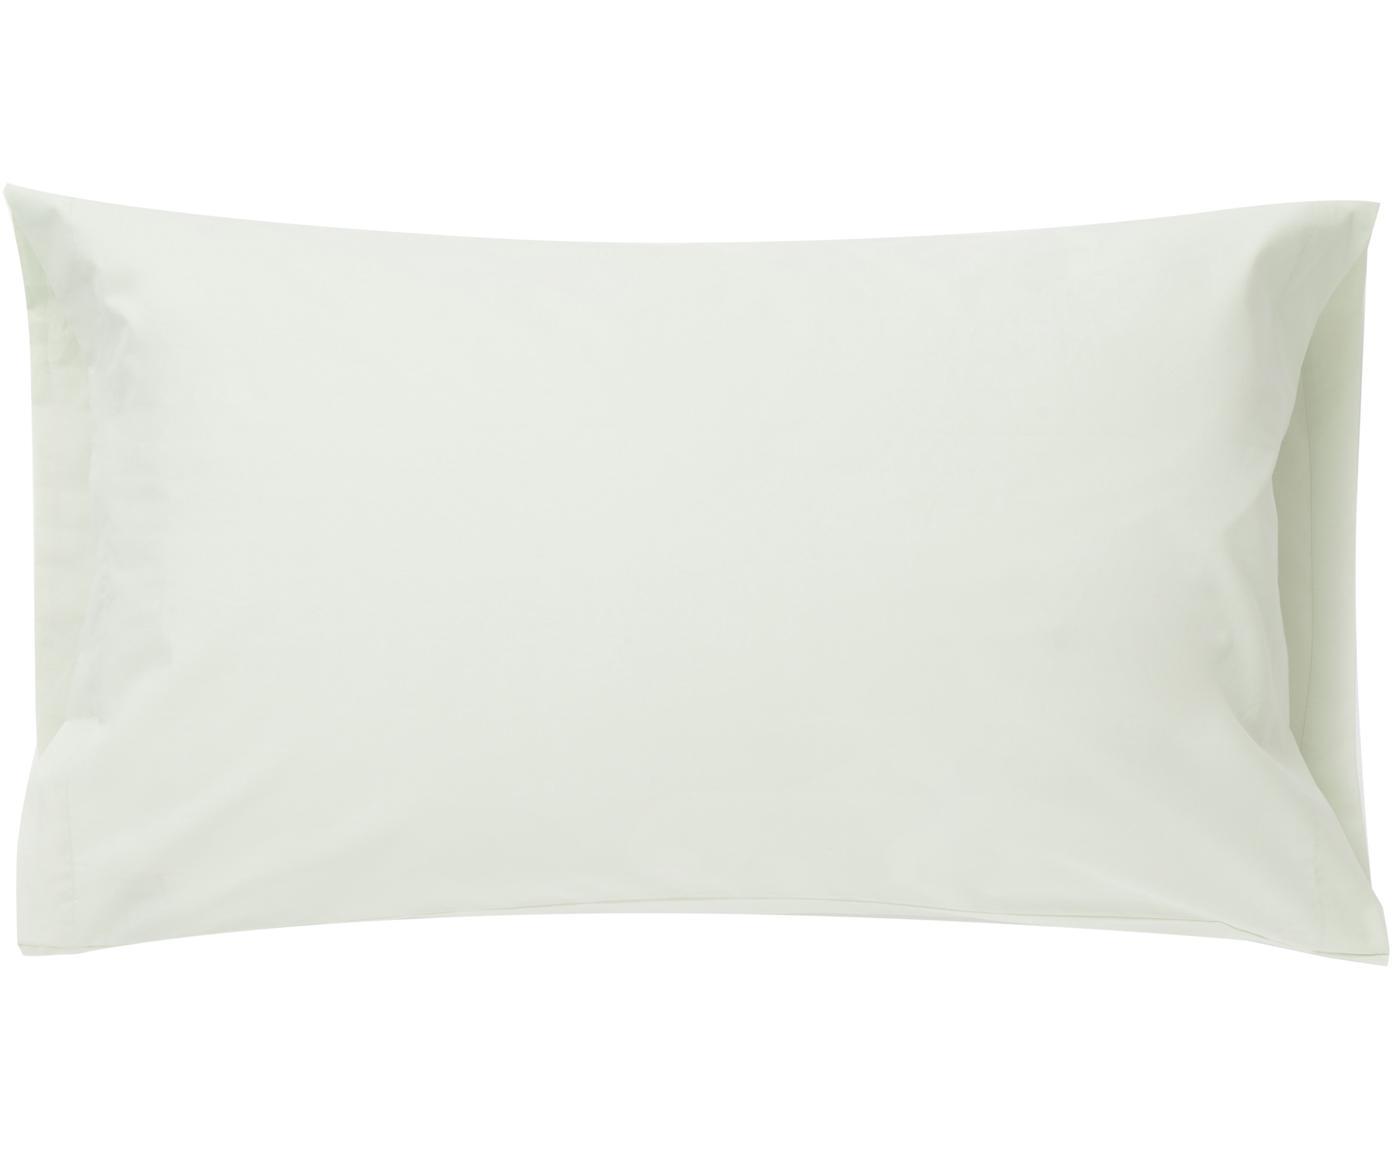 Funda de almohada Plain Dye, Algodón, Verde claro, An 50 x L 110 cm